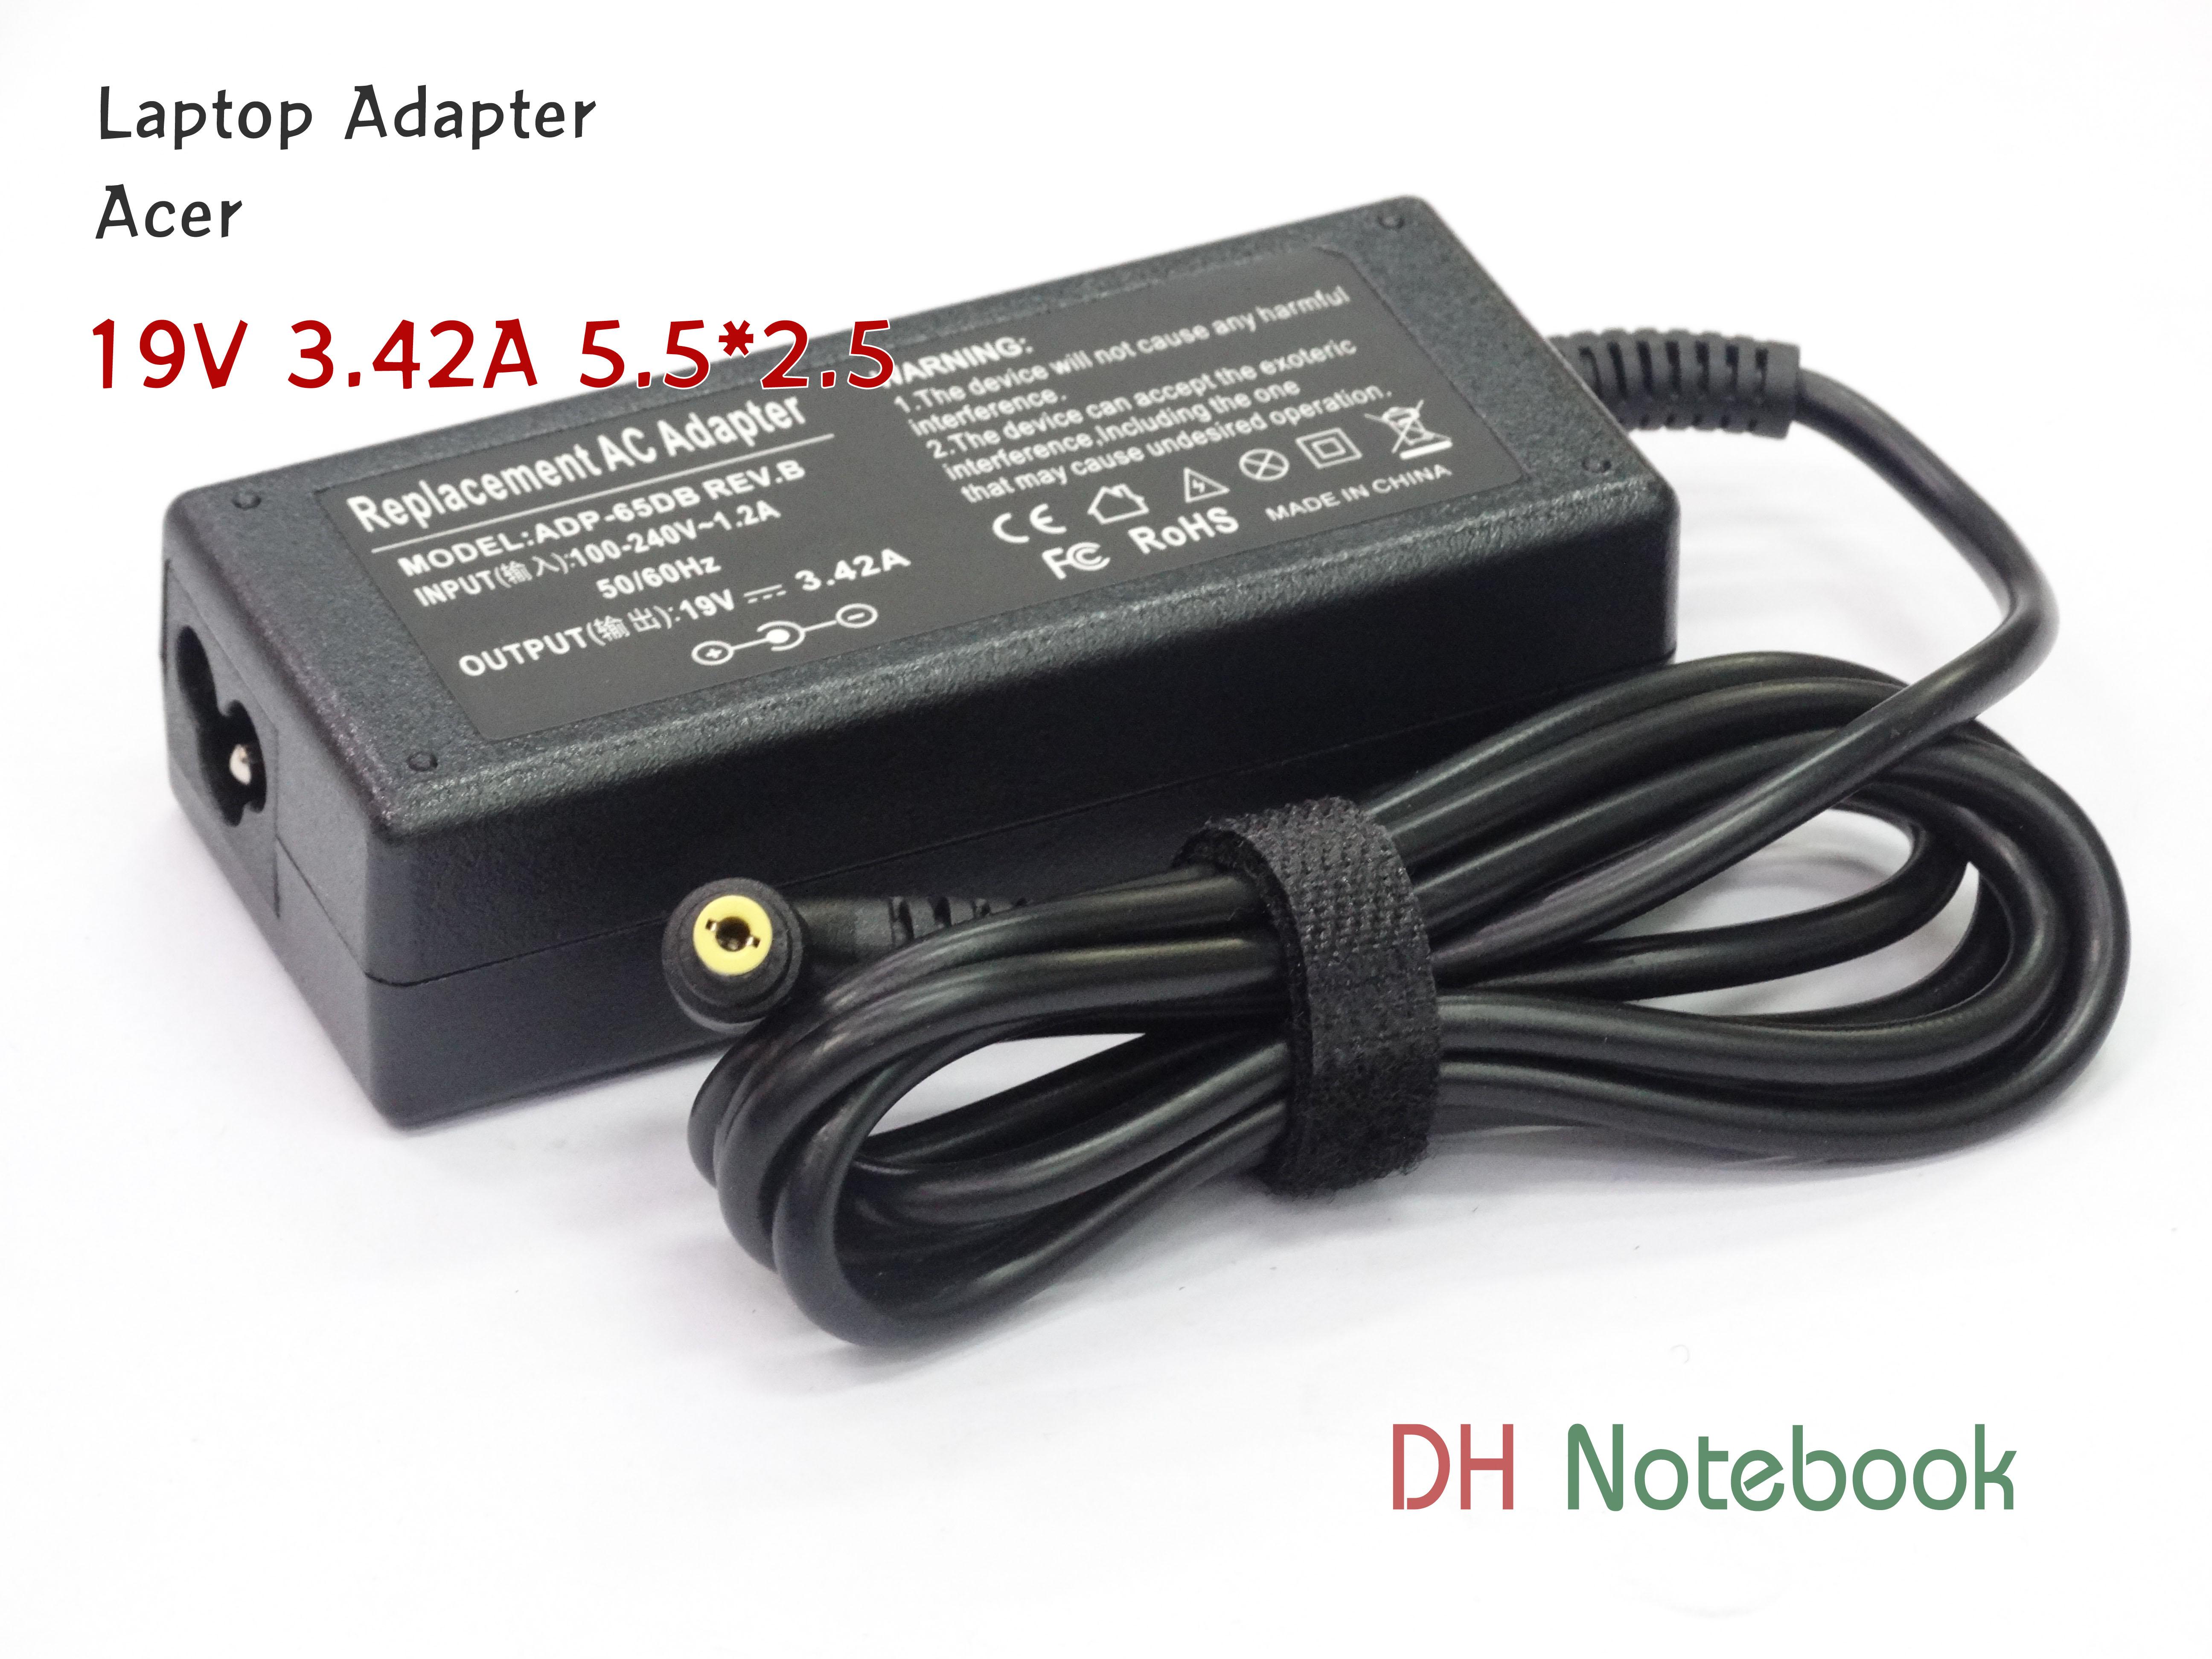 Adapter ACER 19V 3.42A 5.5*2.5